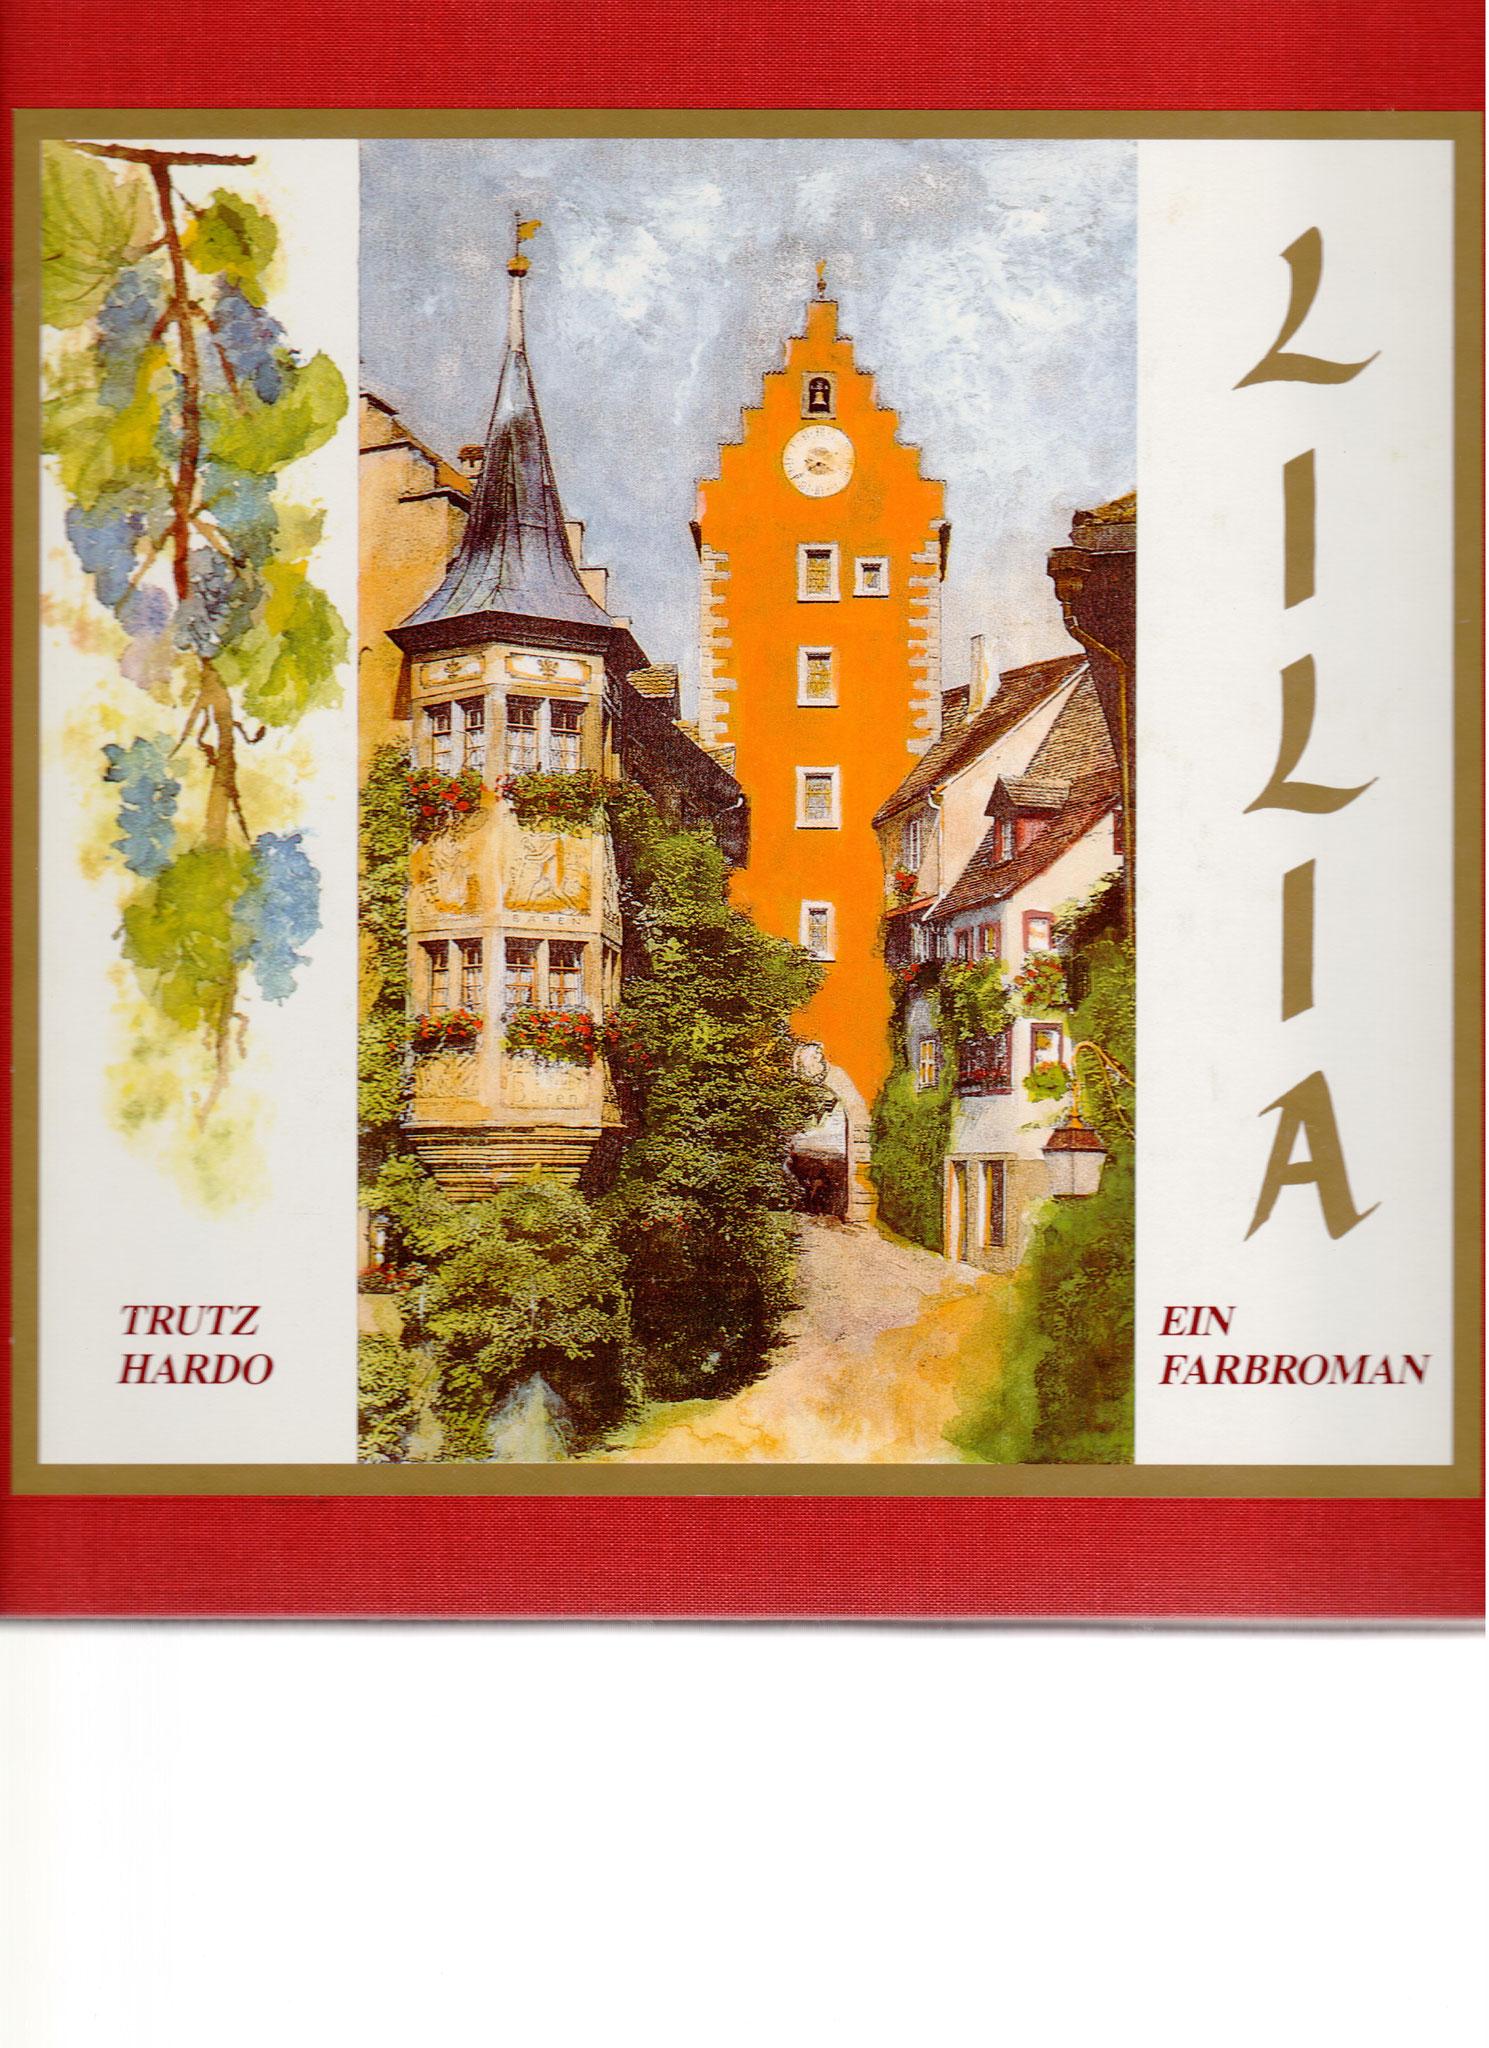 Lilia - Farbroman - Band 2